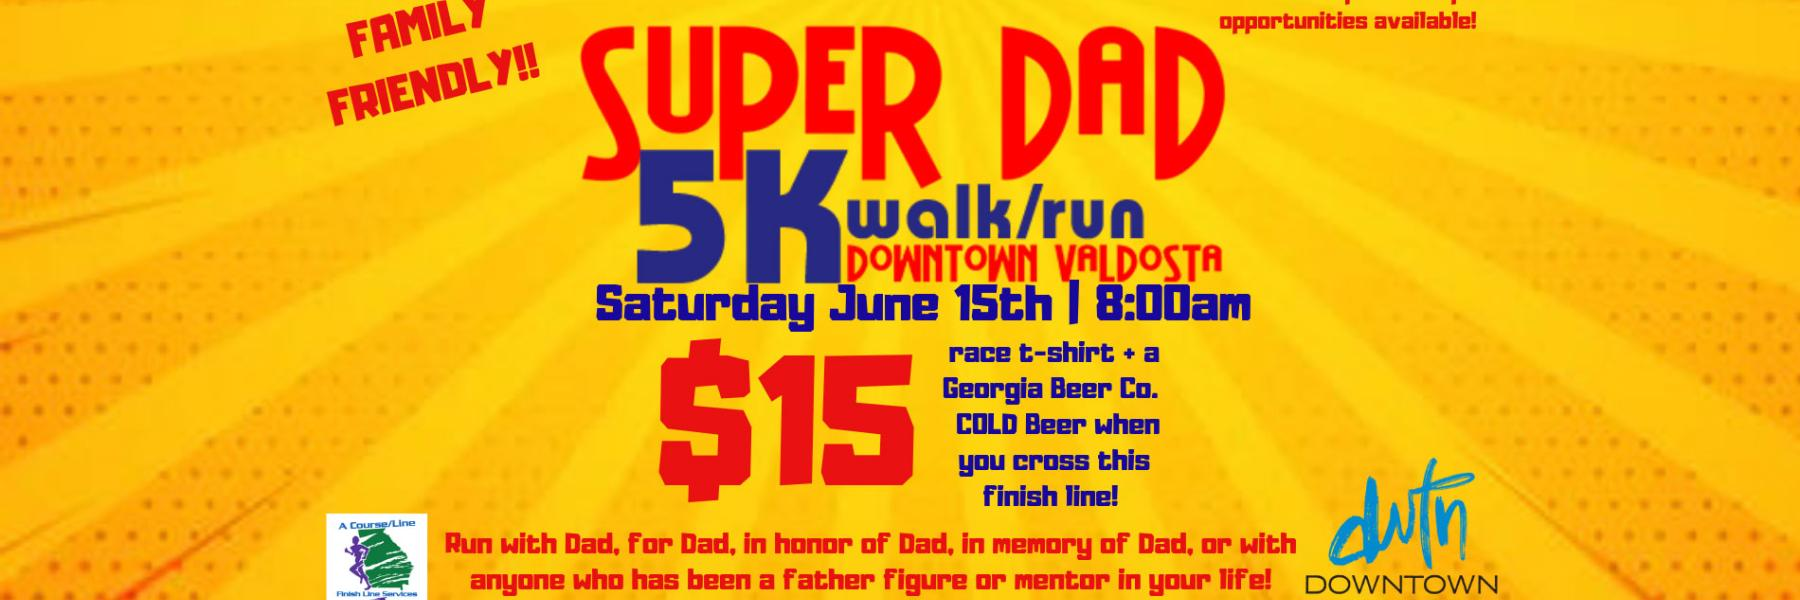 Super Dad 5k